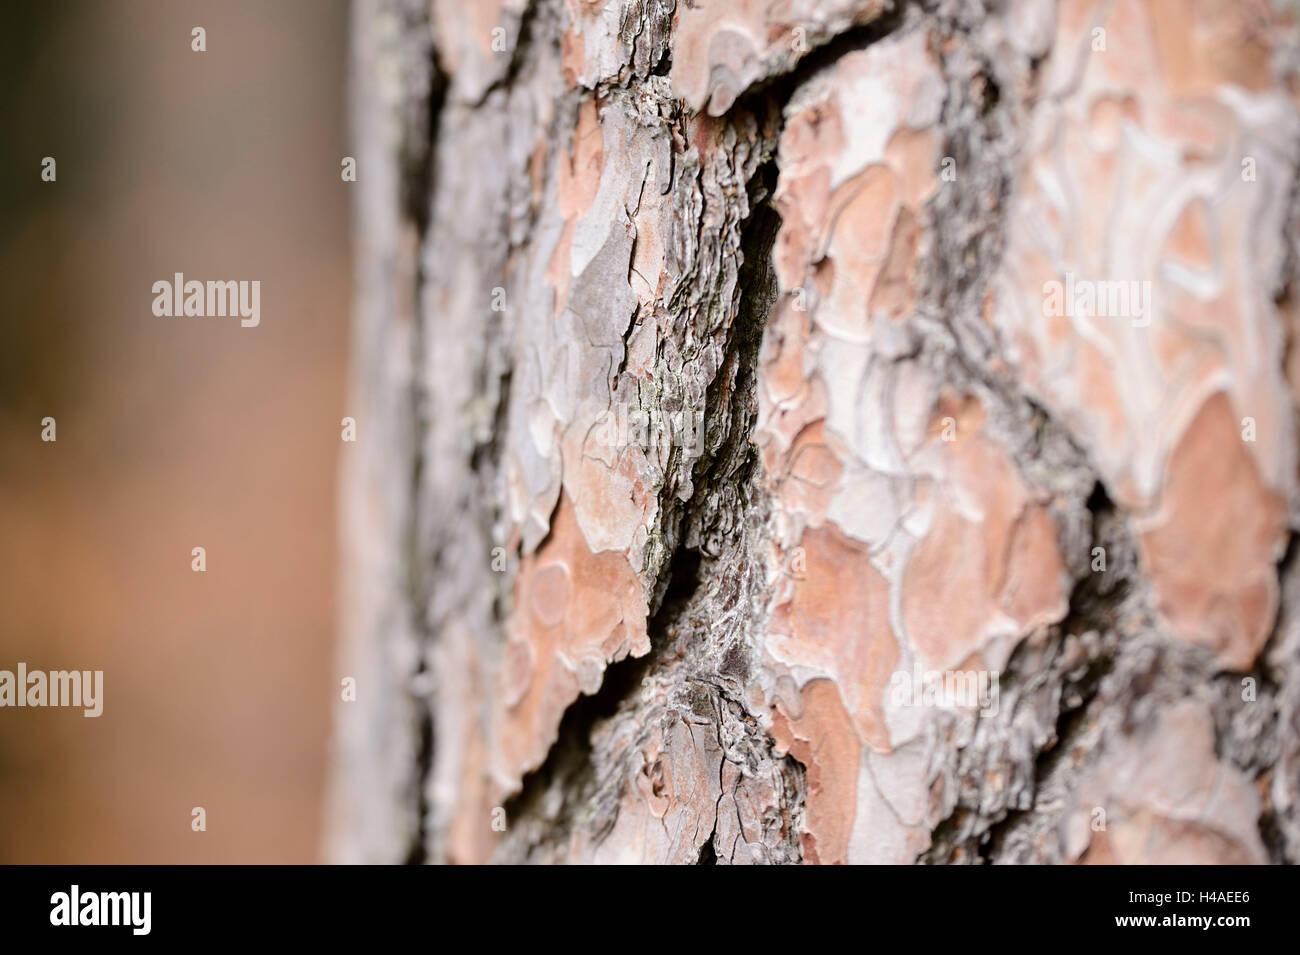 Scots pine, Pinus sylvestris, bark, detail, - Stock Image